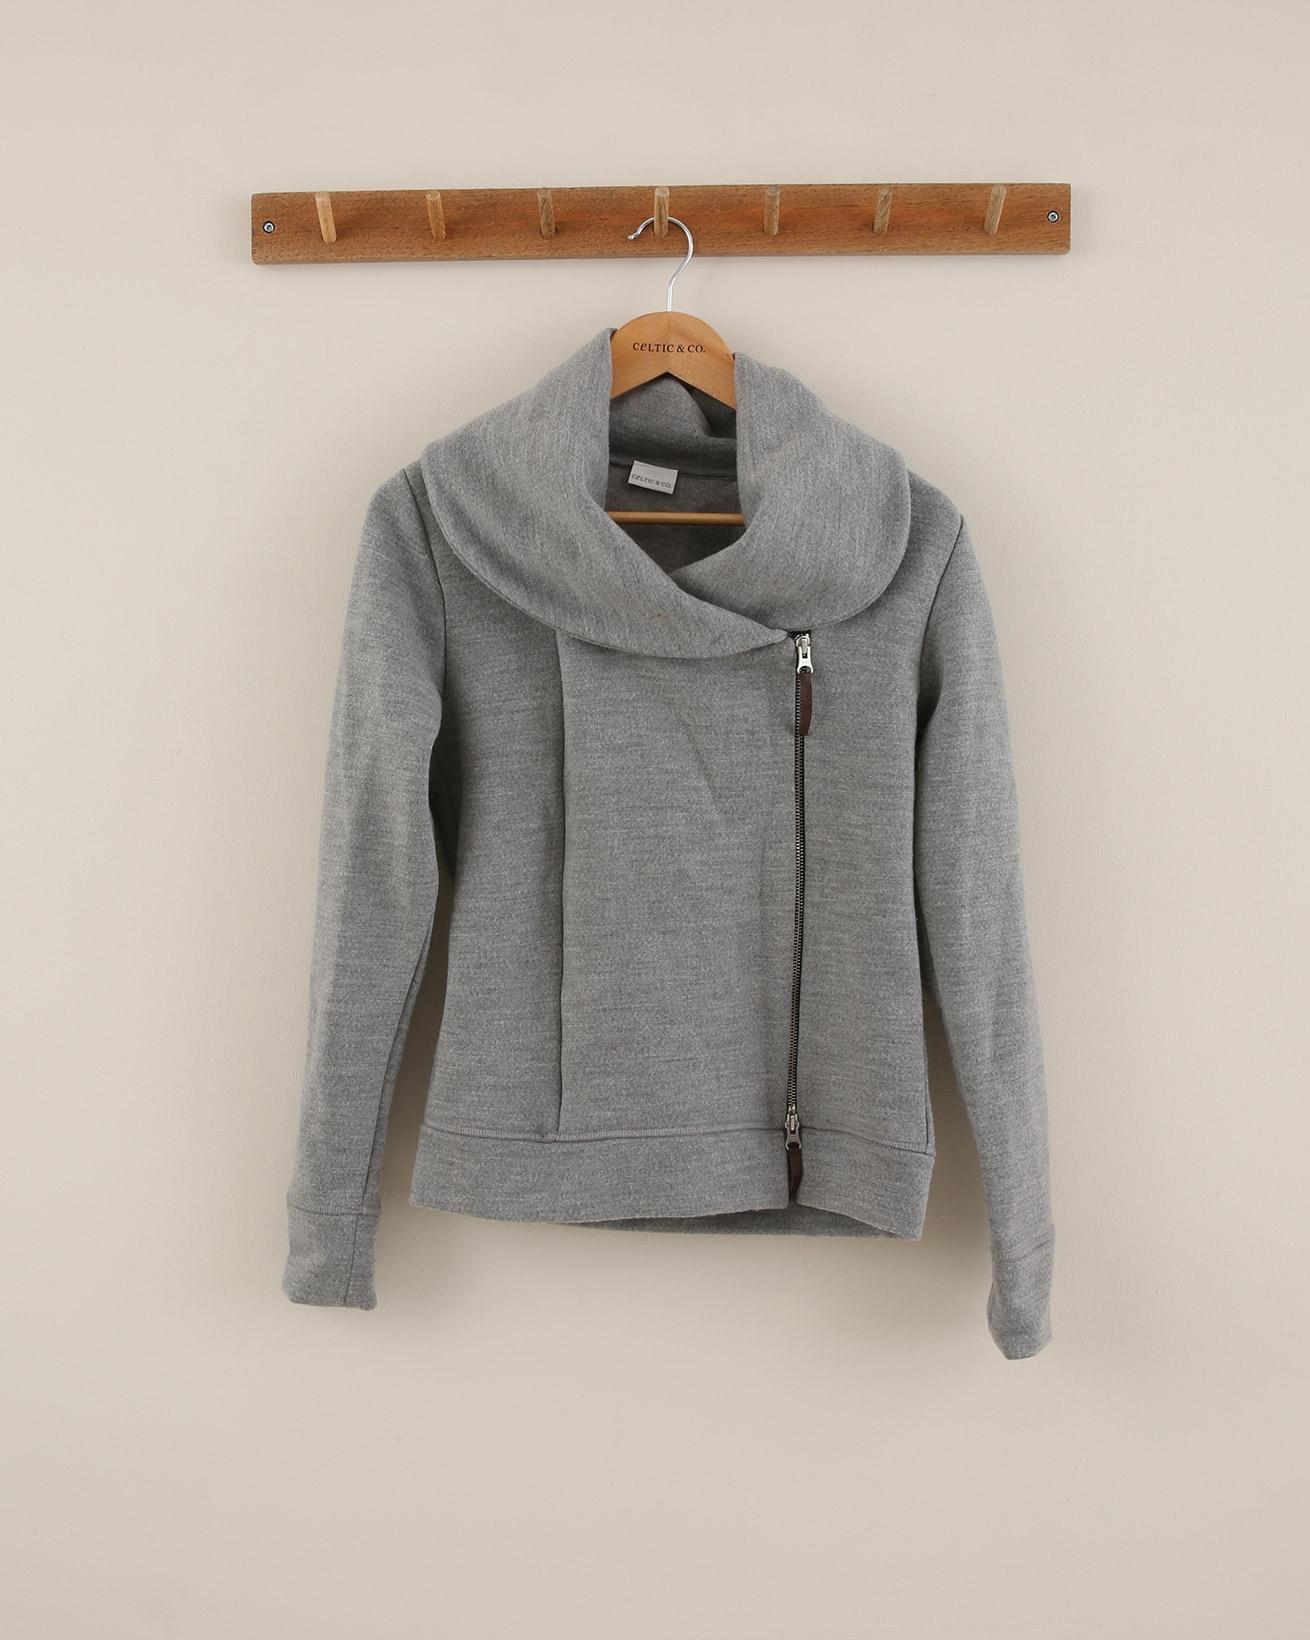 Asymmetric Wide Collar Hoodie - Size Small - Grey - 1861